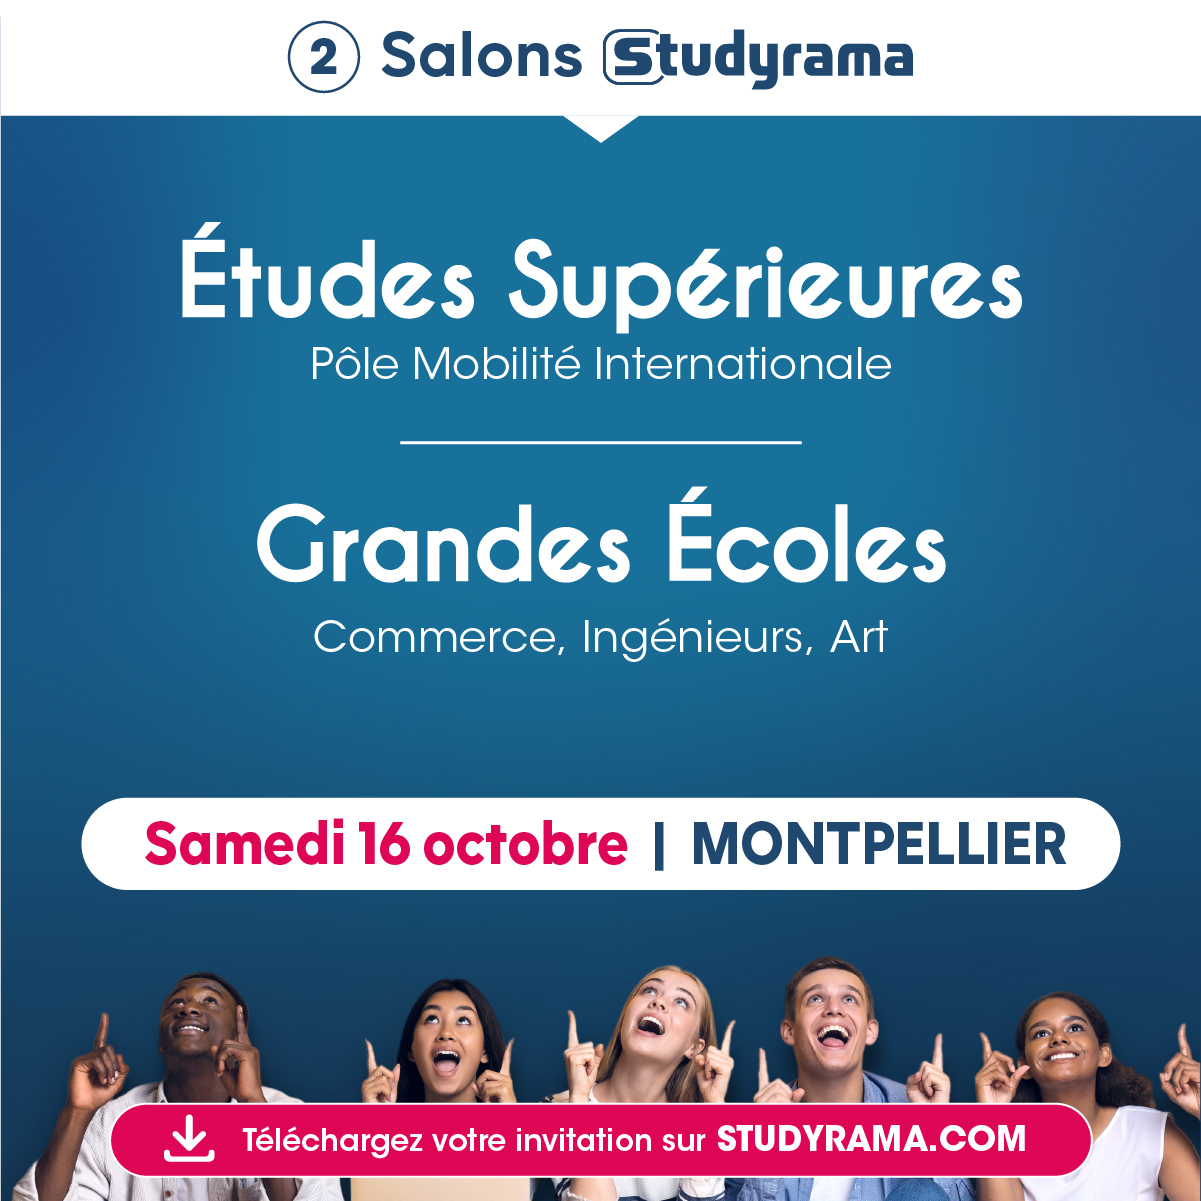 salon Studyrama Montpellier